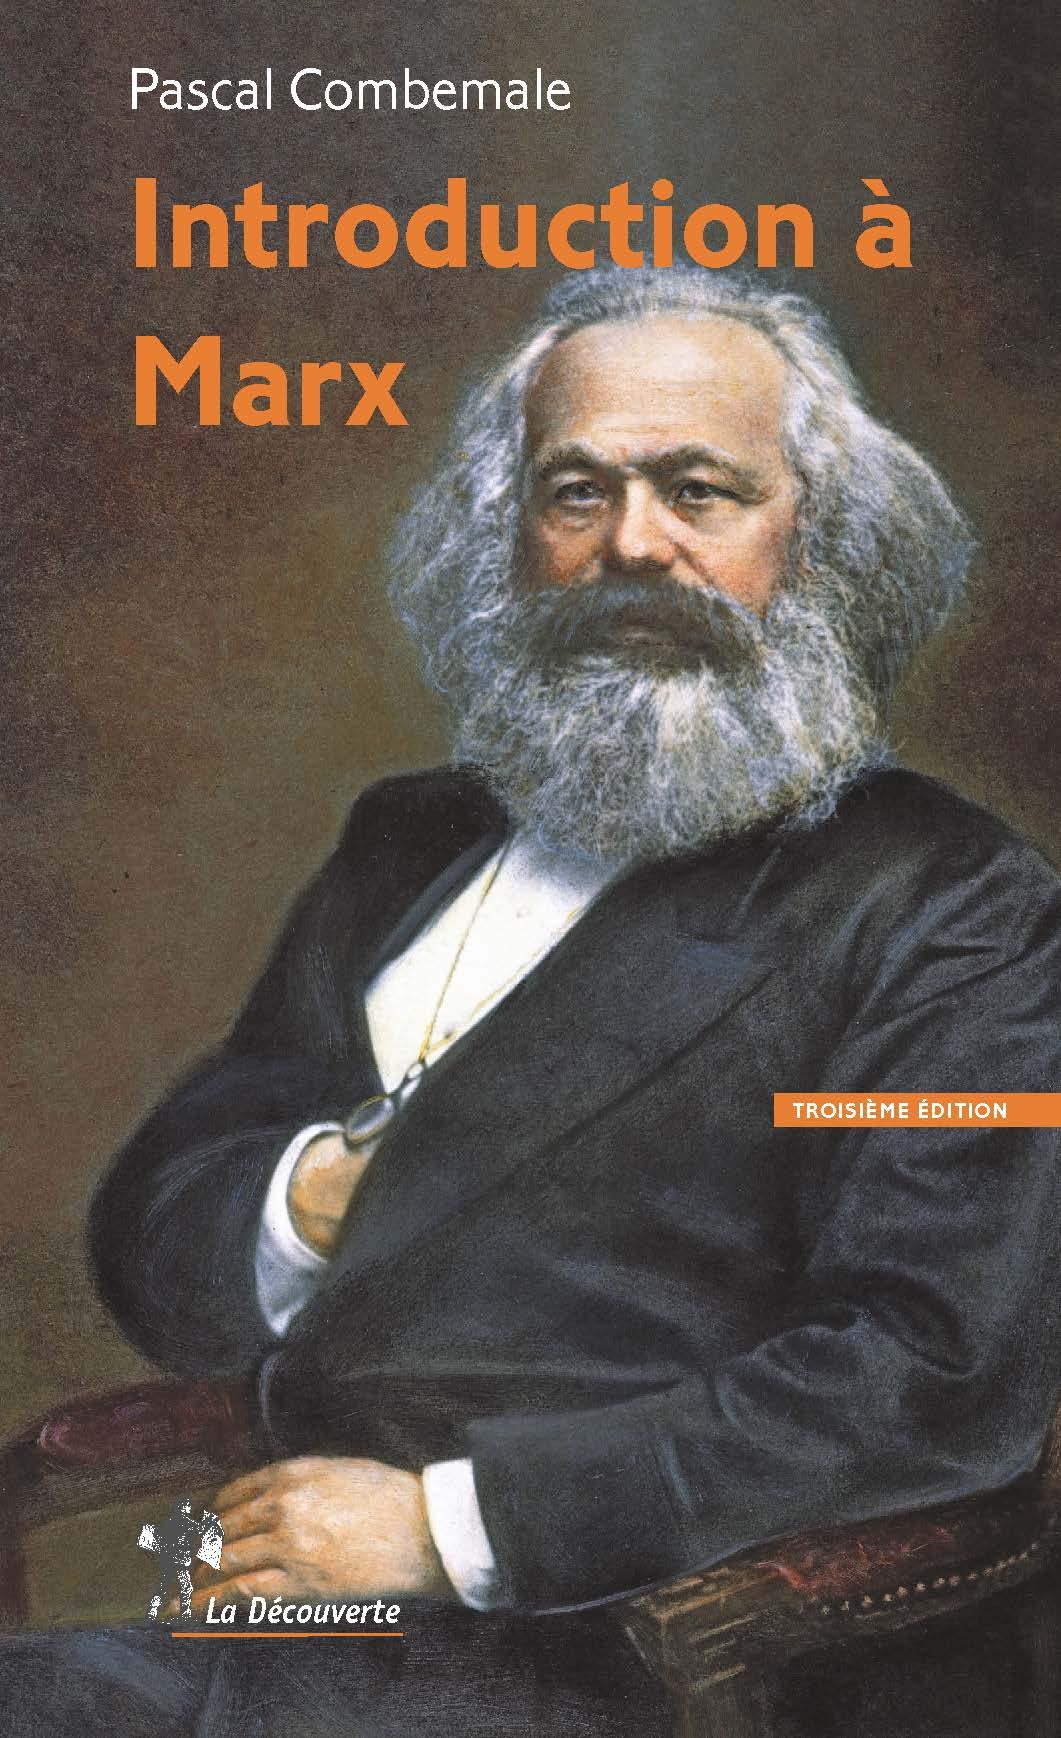 Introduction à Marx - Pascal Combemale | Cairn.info